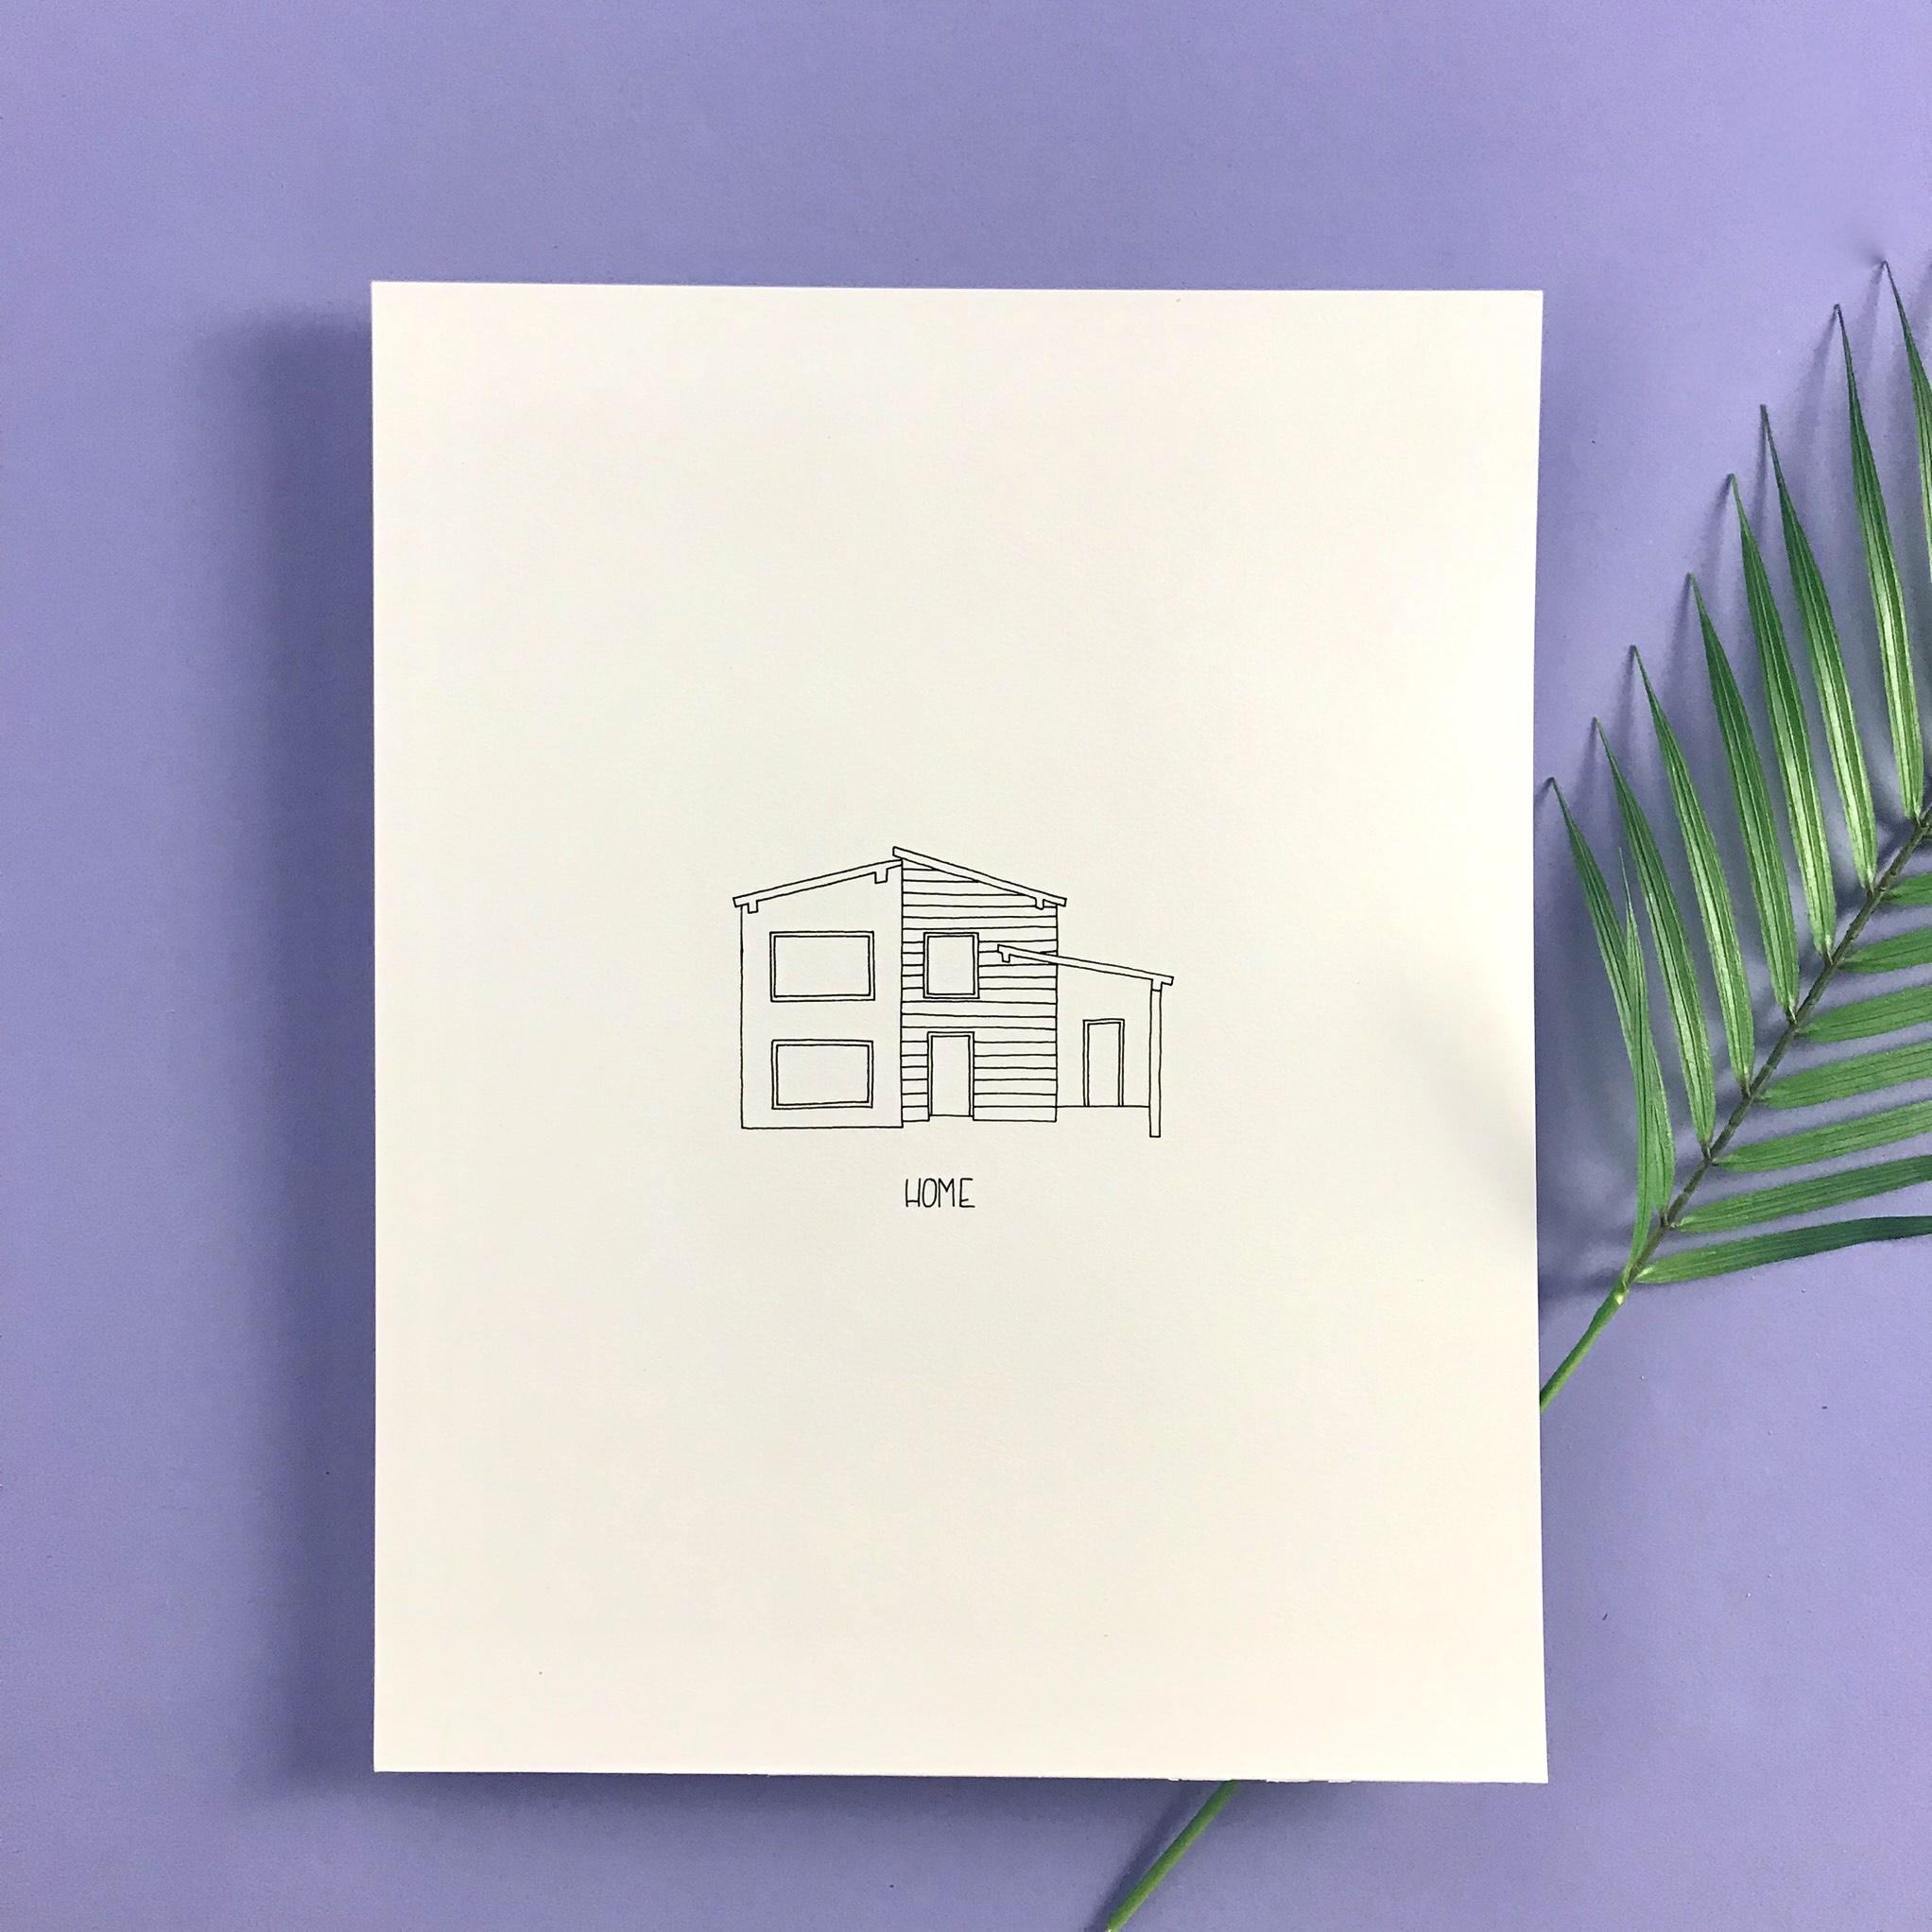 11X14 HOME - $85